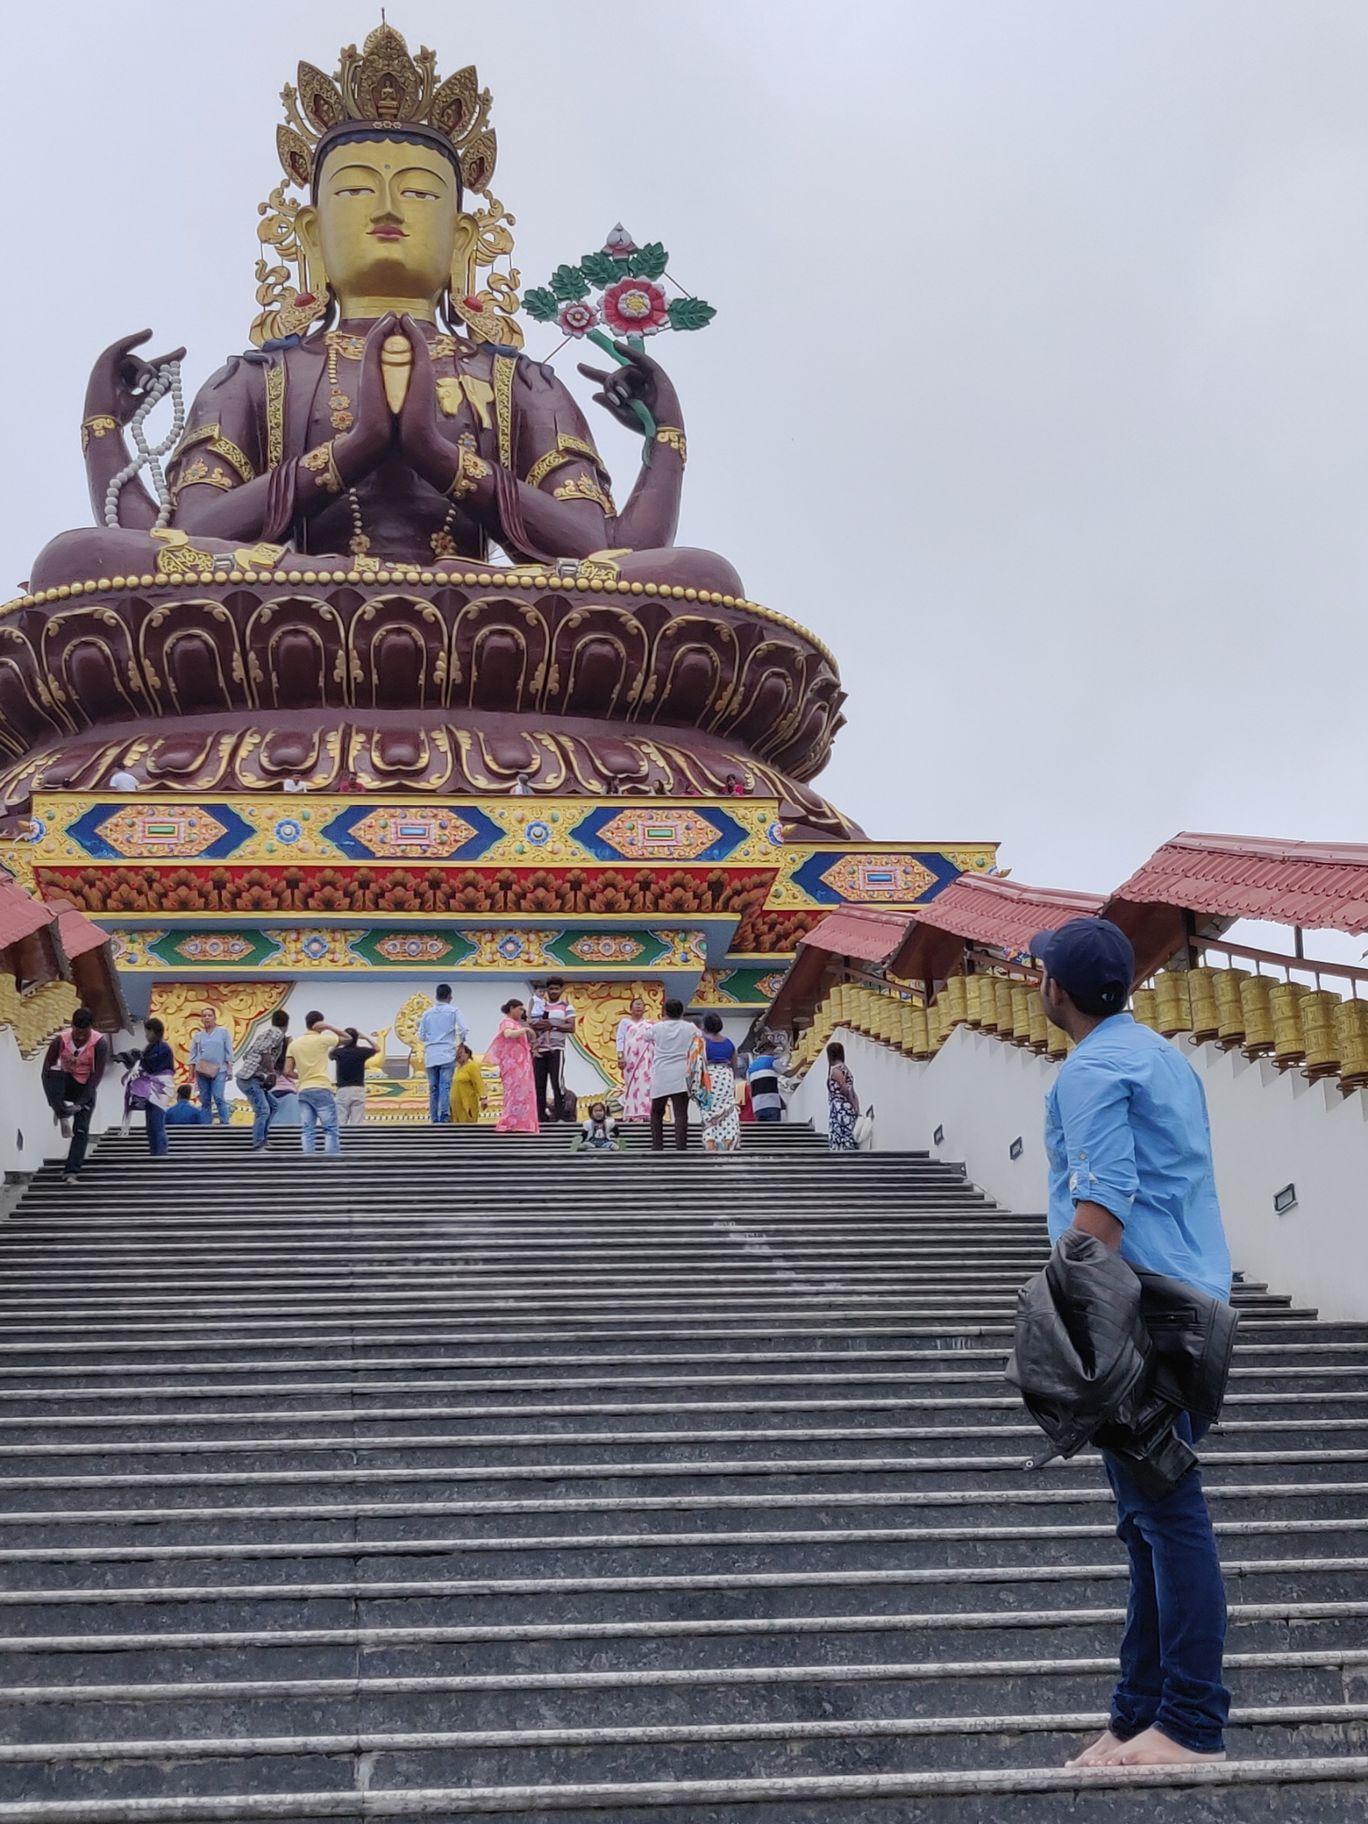 Photo of Sanga Choeling Monastery By Rishabh Jaiswal